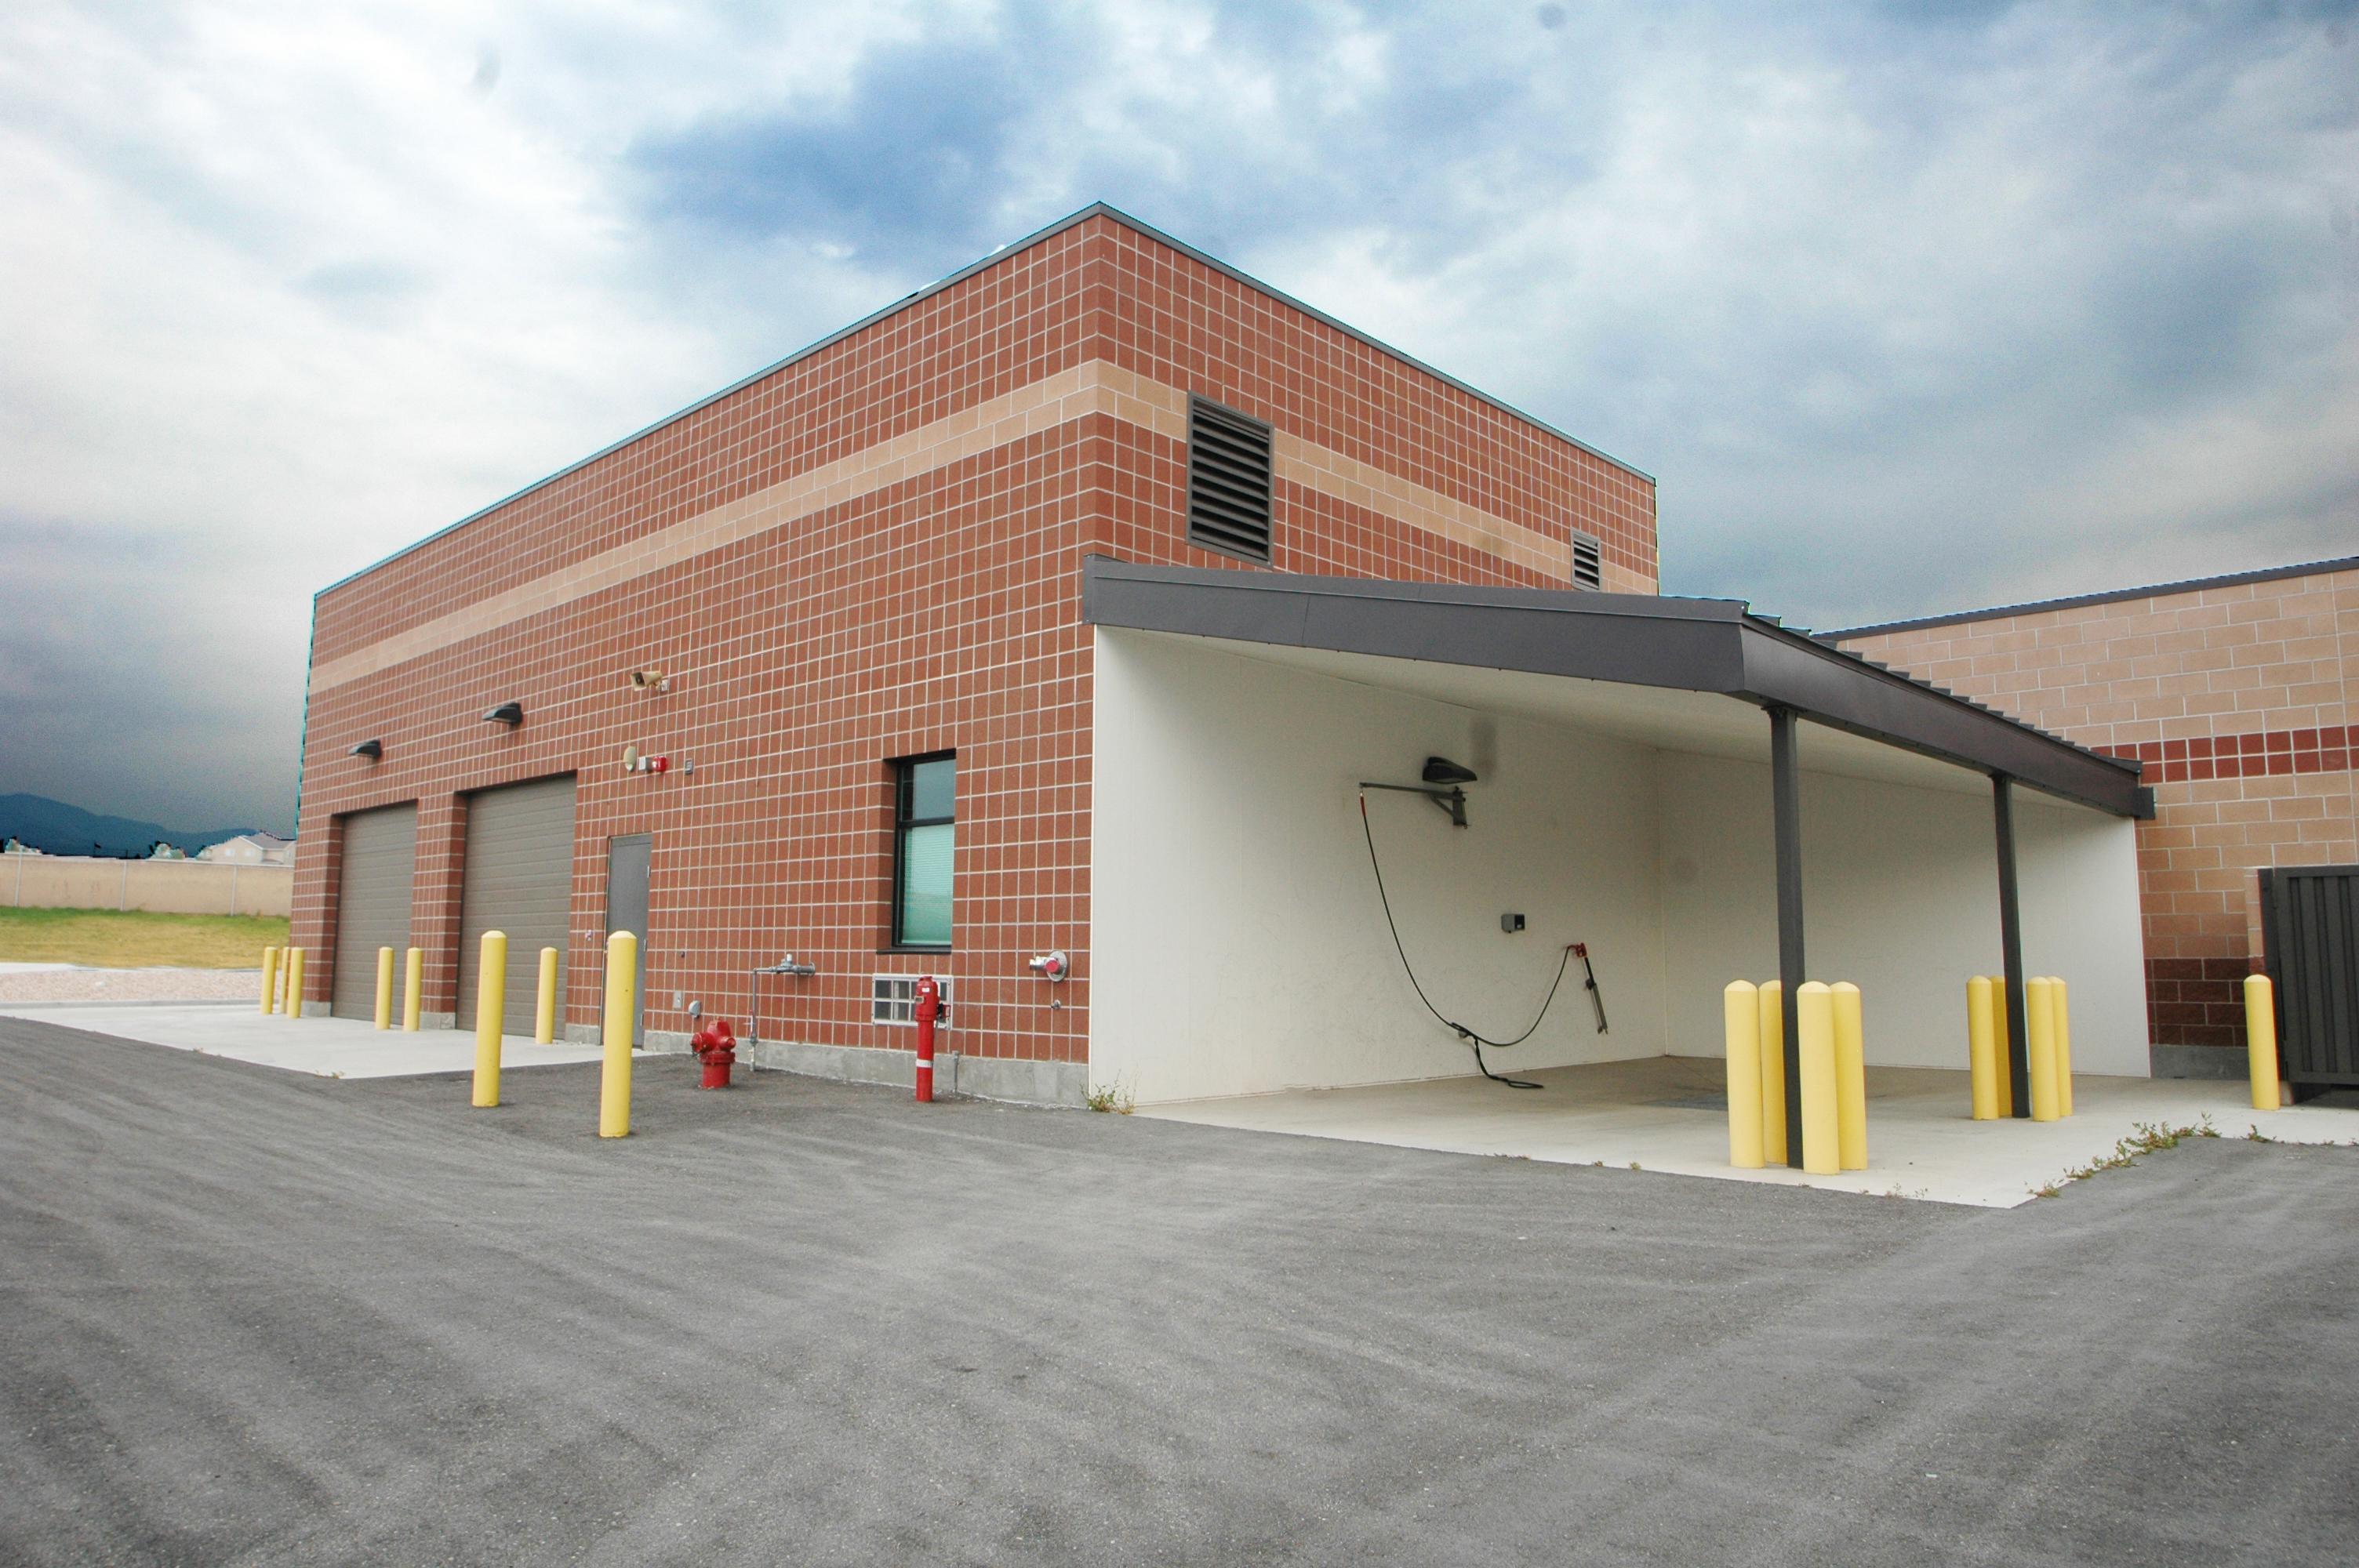 South Salt Lake Mosquito Abatement District Vehicle Storage / Maintenance Building - West Jordan, UT